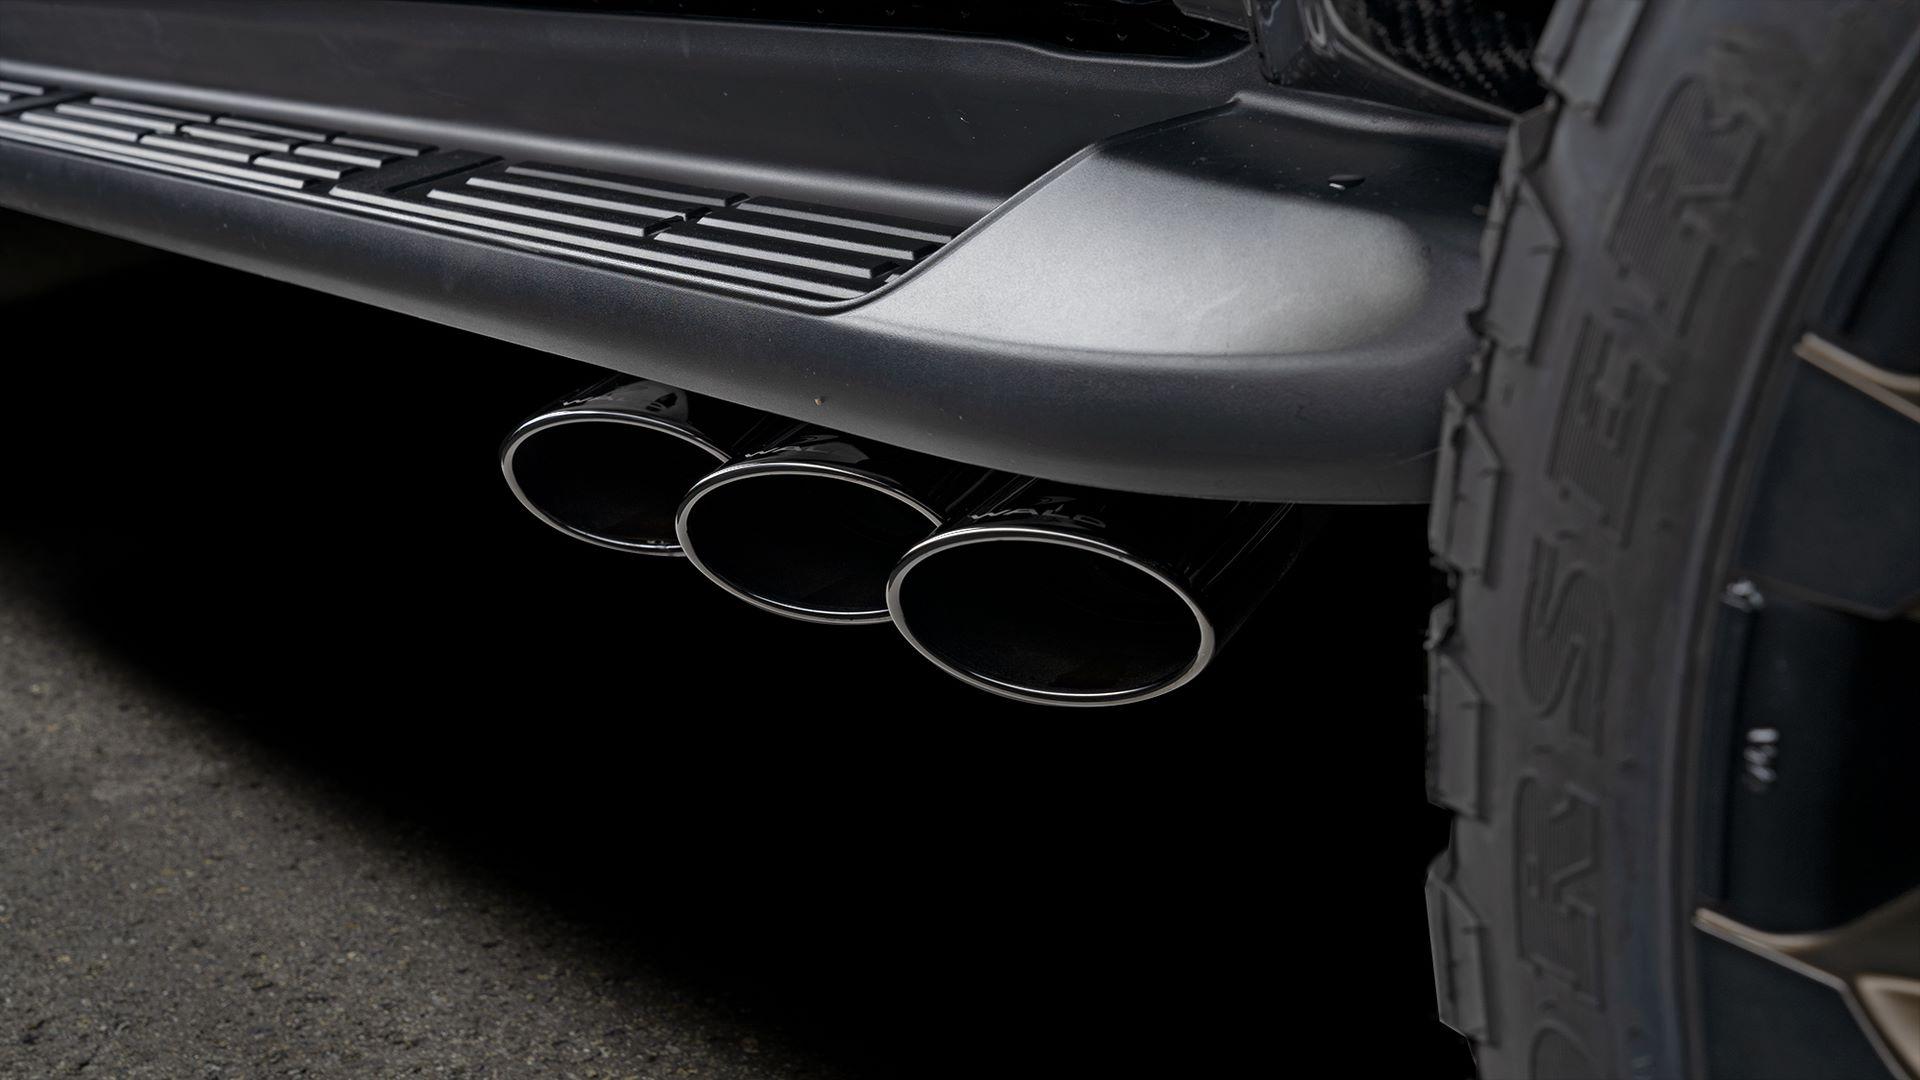 Toyota-Hilux-Black-Bison-by-Wald-International-10